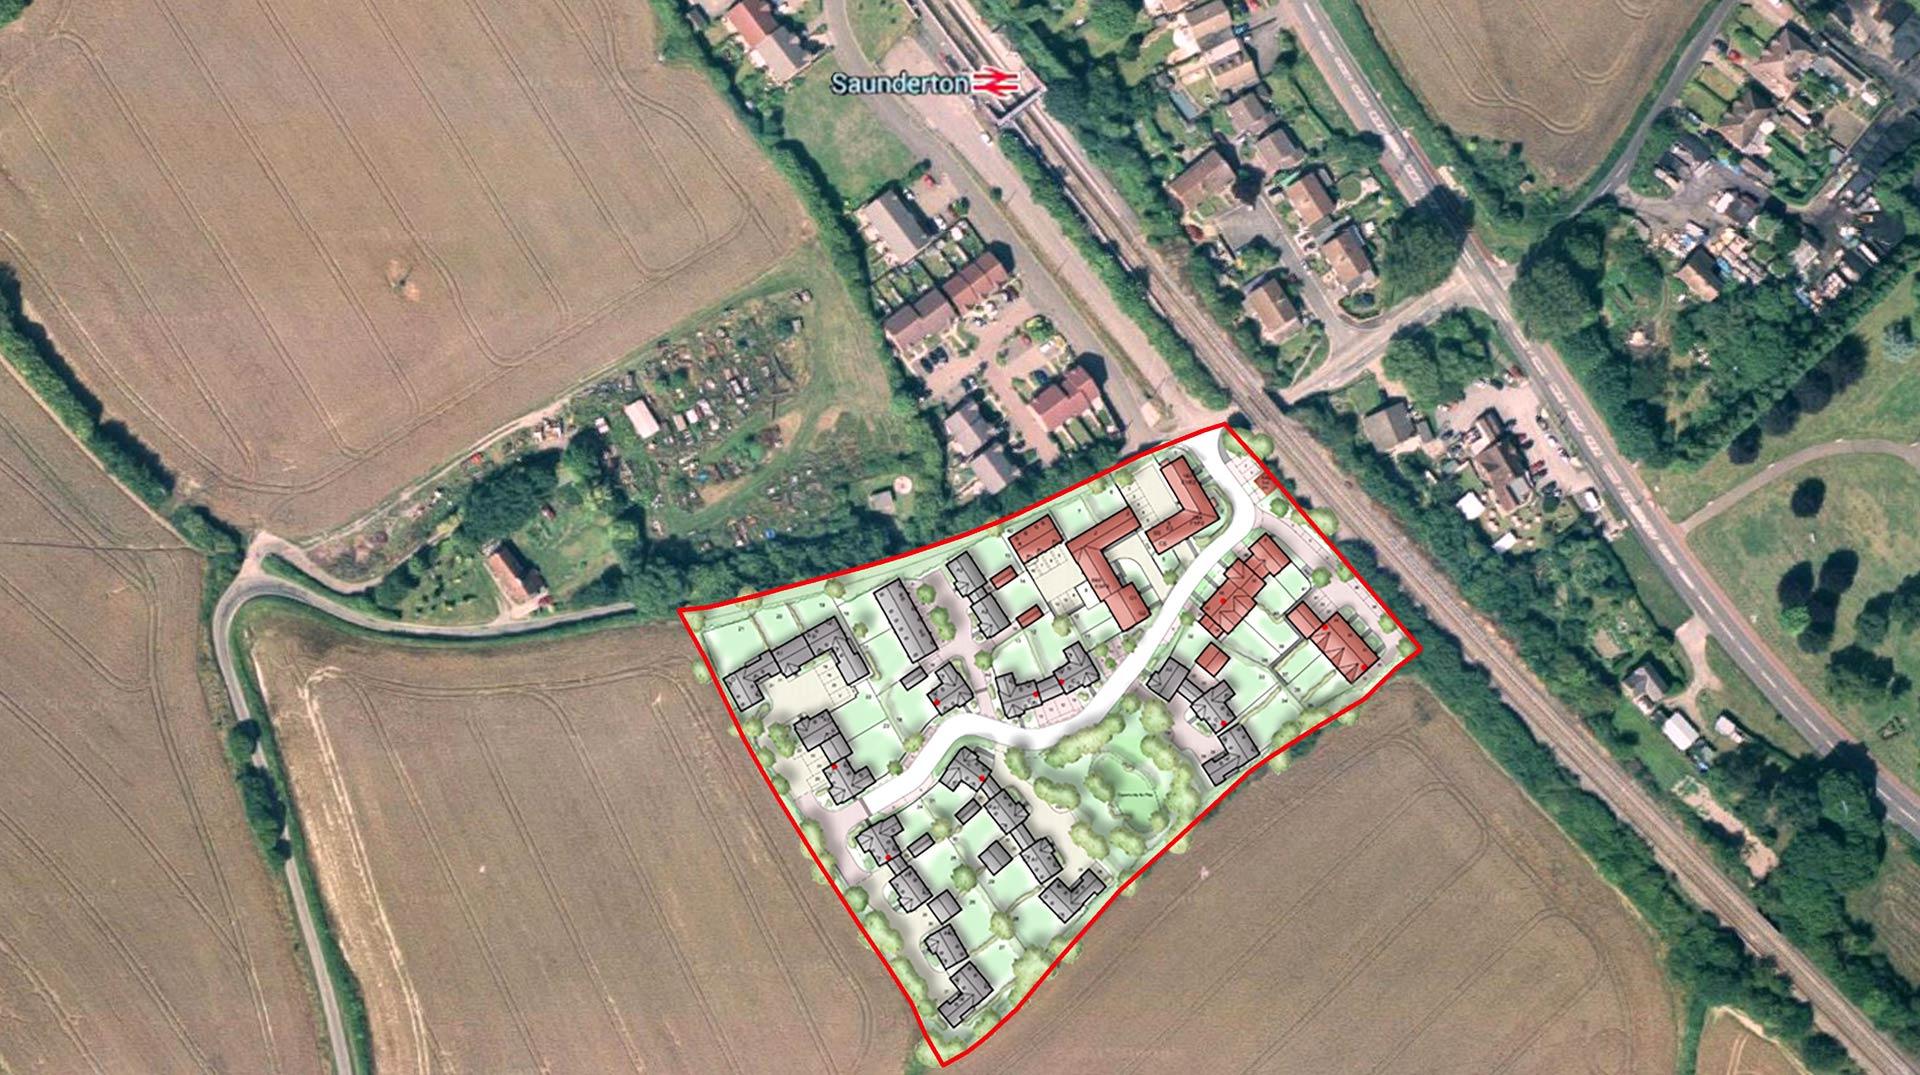 Saunderton Site Location Overlay - Dandara Strategic Land Project